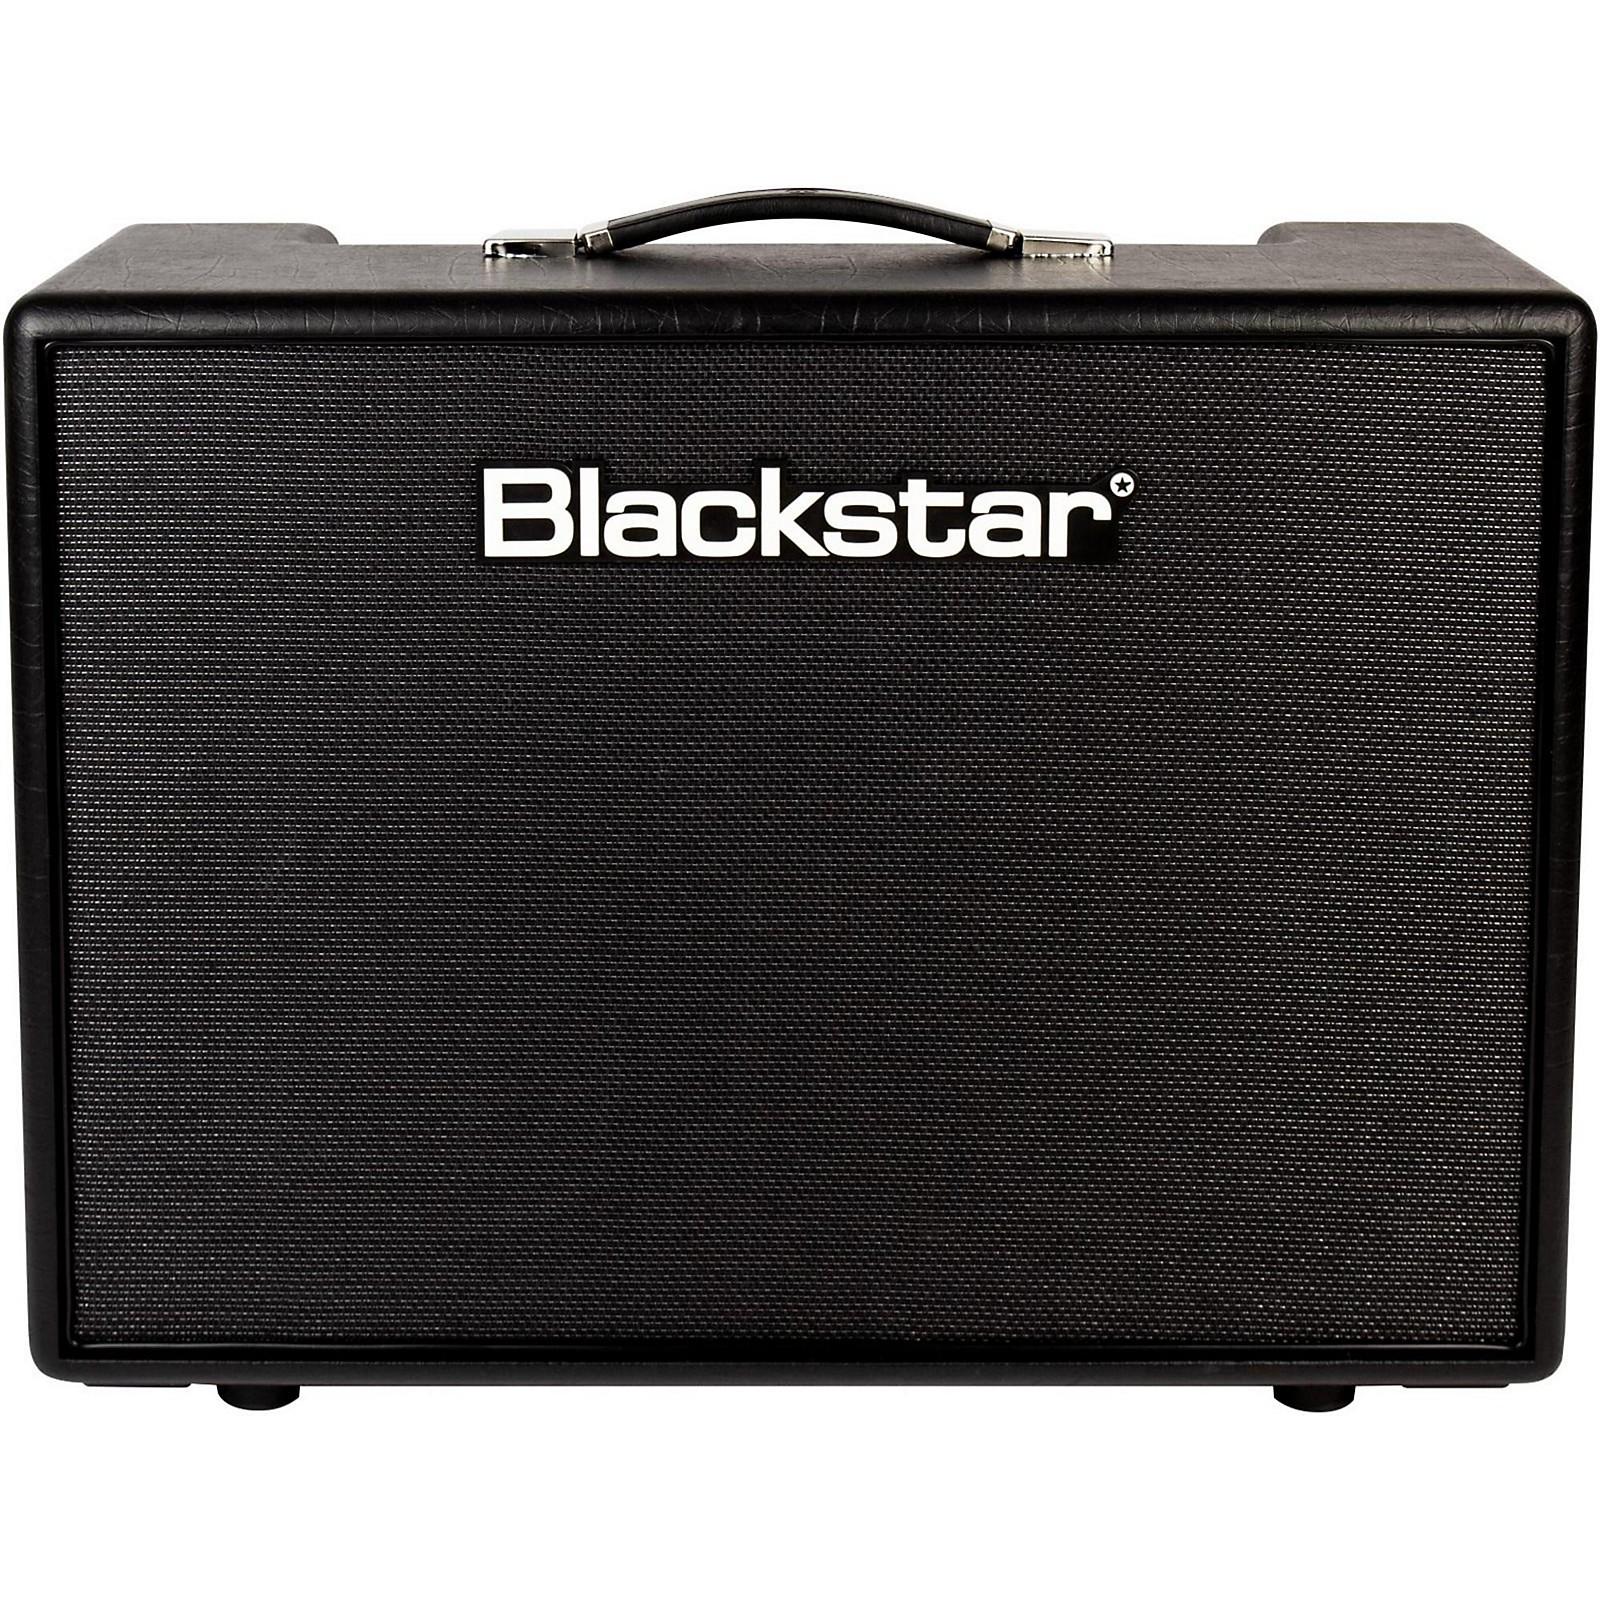 Open Box Blackstar Artist 30 30W 2x12 Tube Guitar Combo Amp